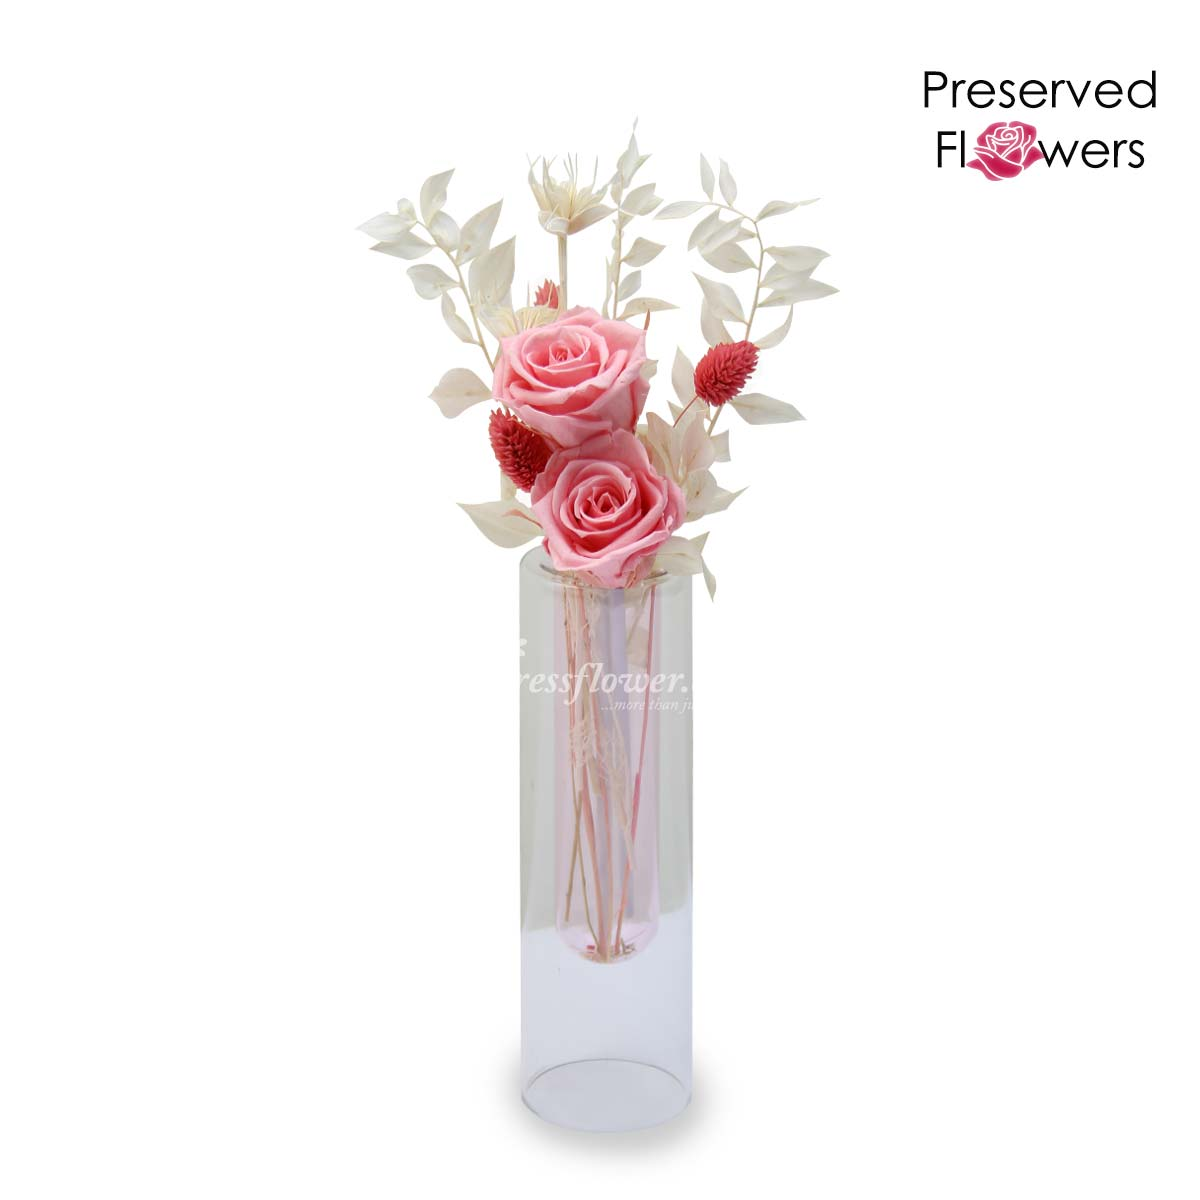 PR2111_Strawberry Garden (Mixed Dried & Preserved Flowers)_B